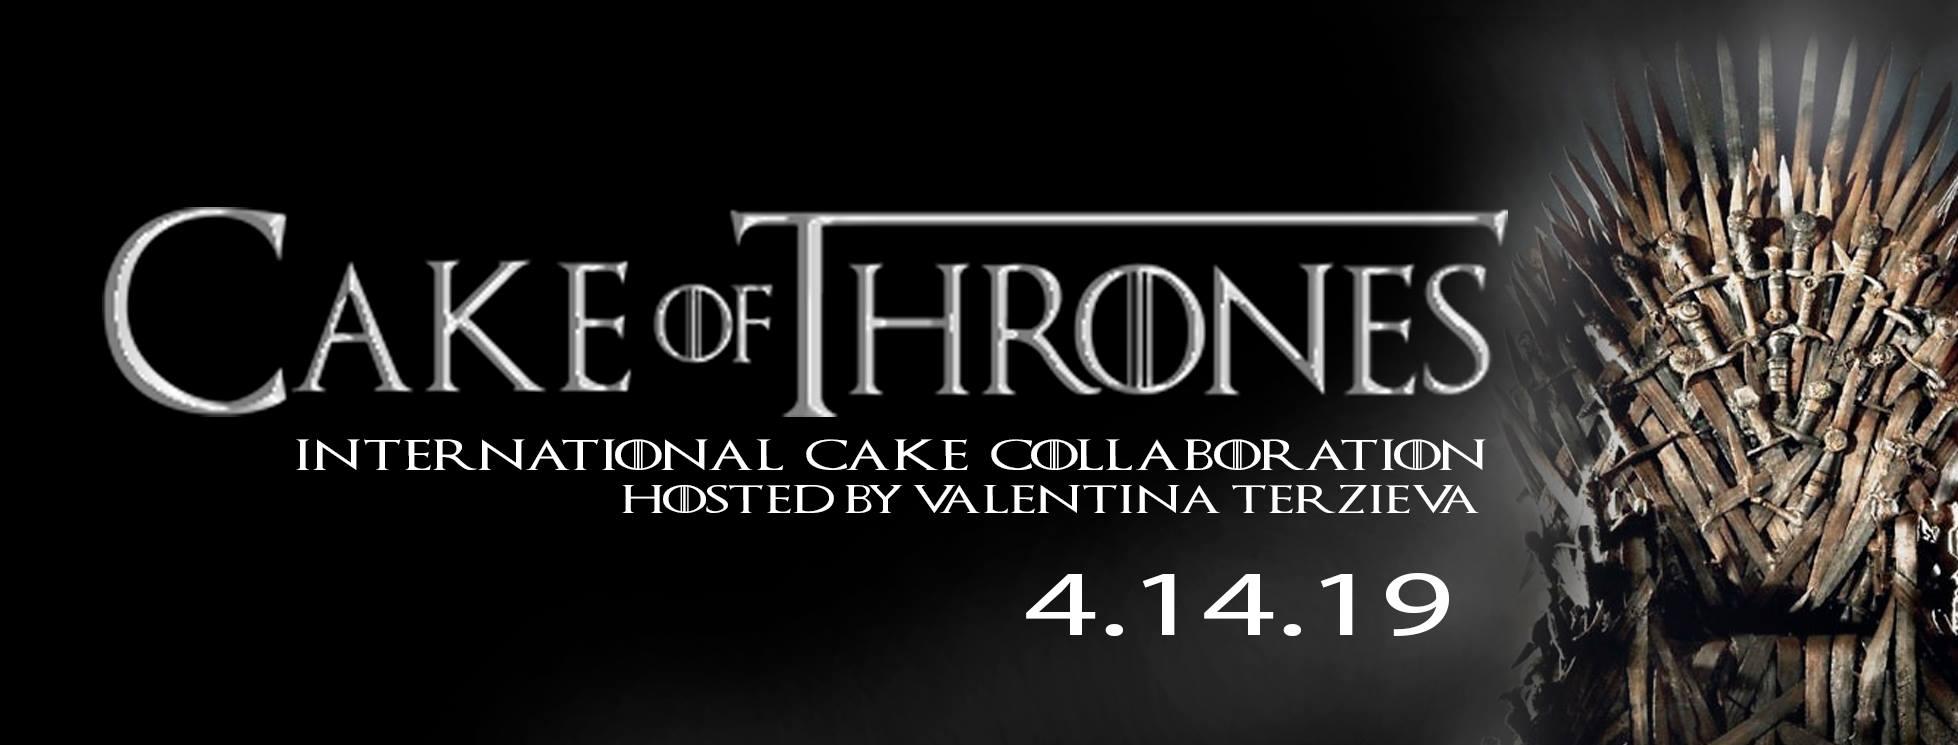 cake of thrones collaboration.jpg